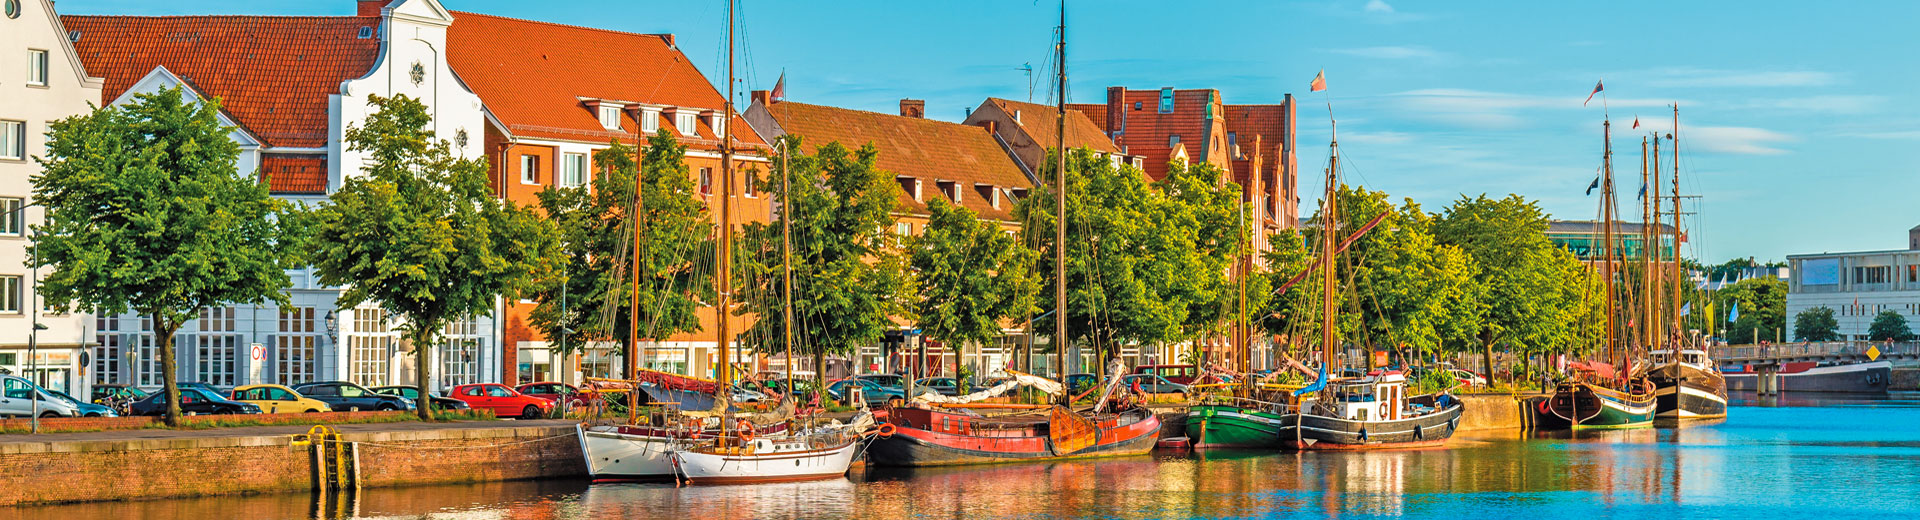 Städtereise Lübeck